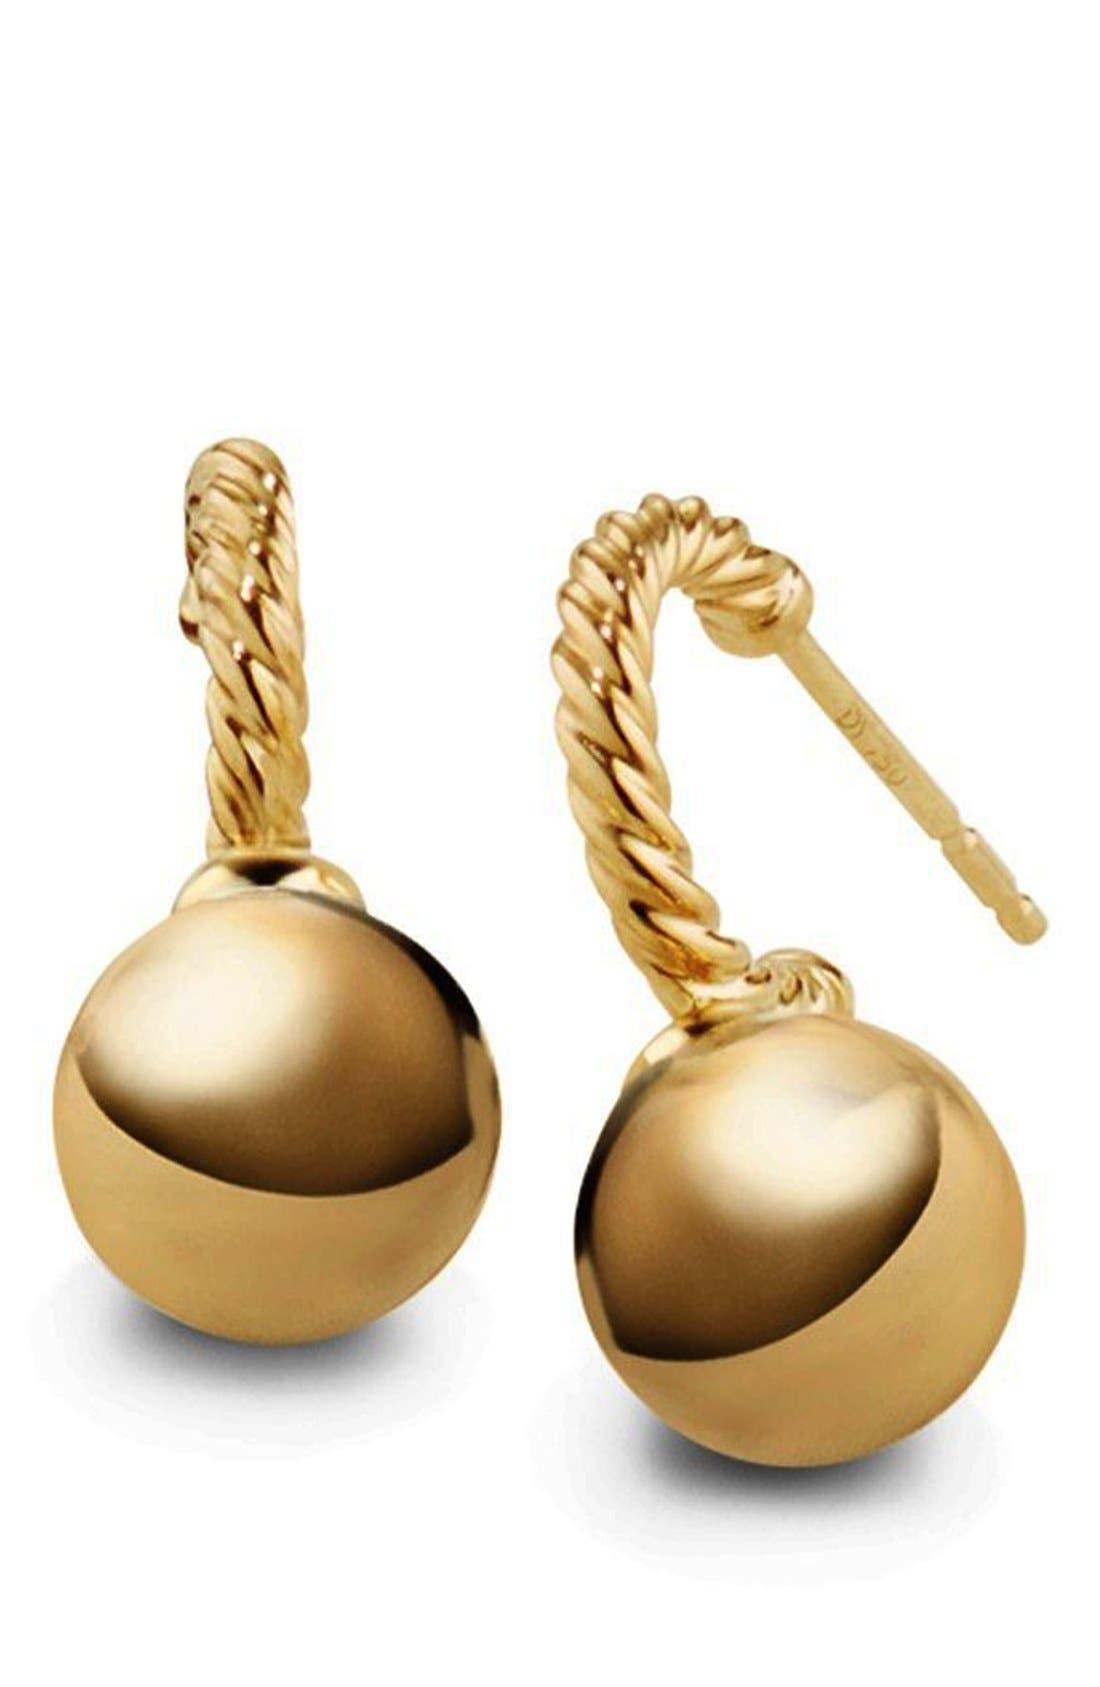 Alternate Image 2  - David Yurman 'Solari' Hoop Earrings in 18K Gold